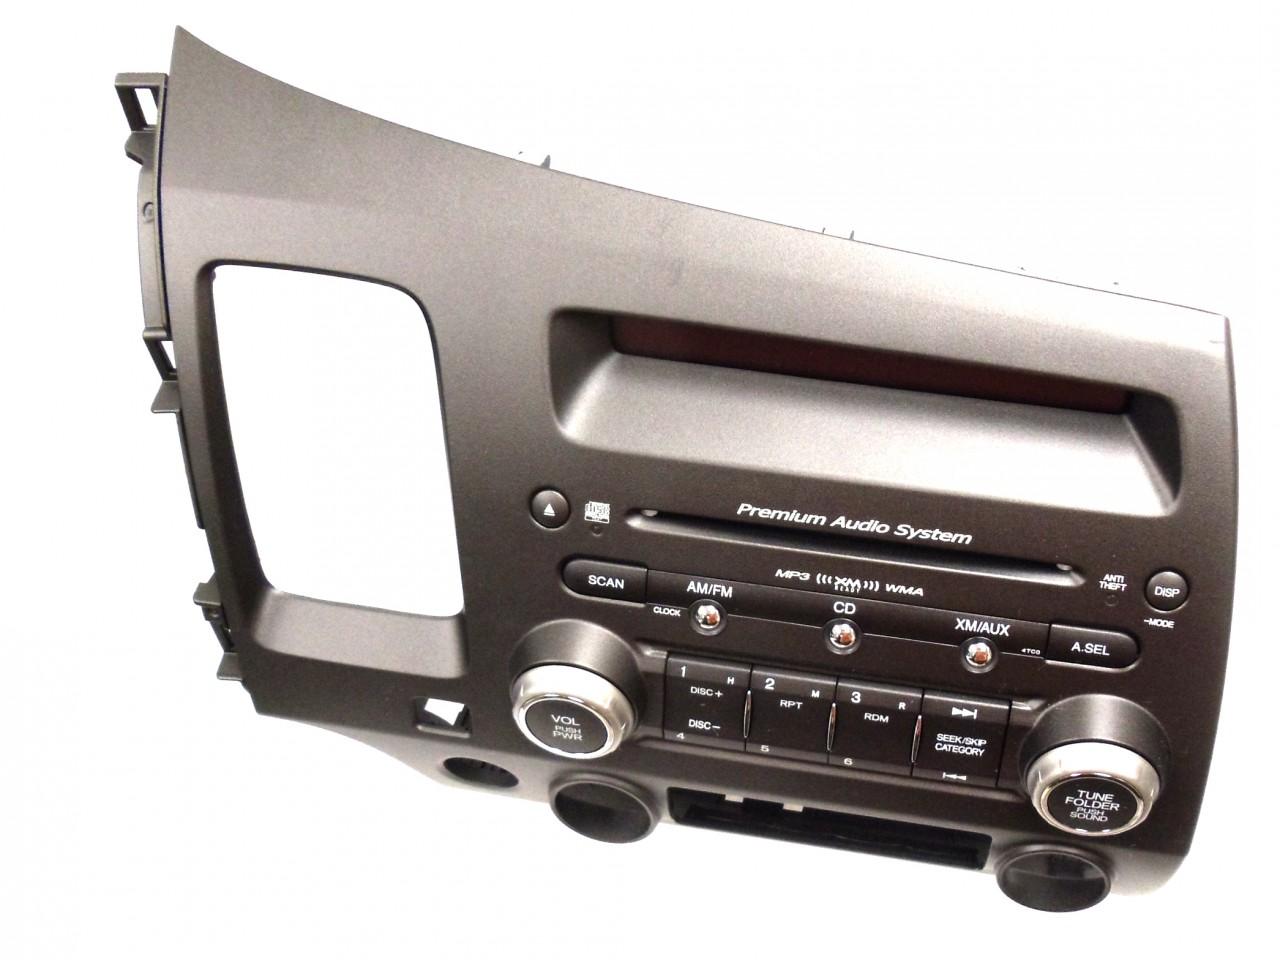 06 07 08 honda civic premium audio system radio stereo mp3. Black Bedroom Furniture Sets. Home Design Ideas